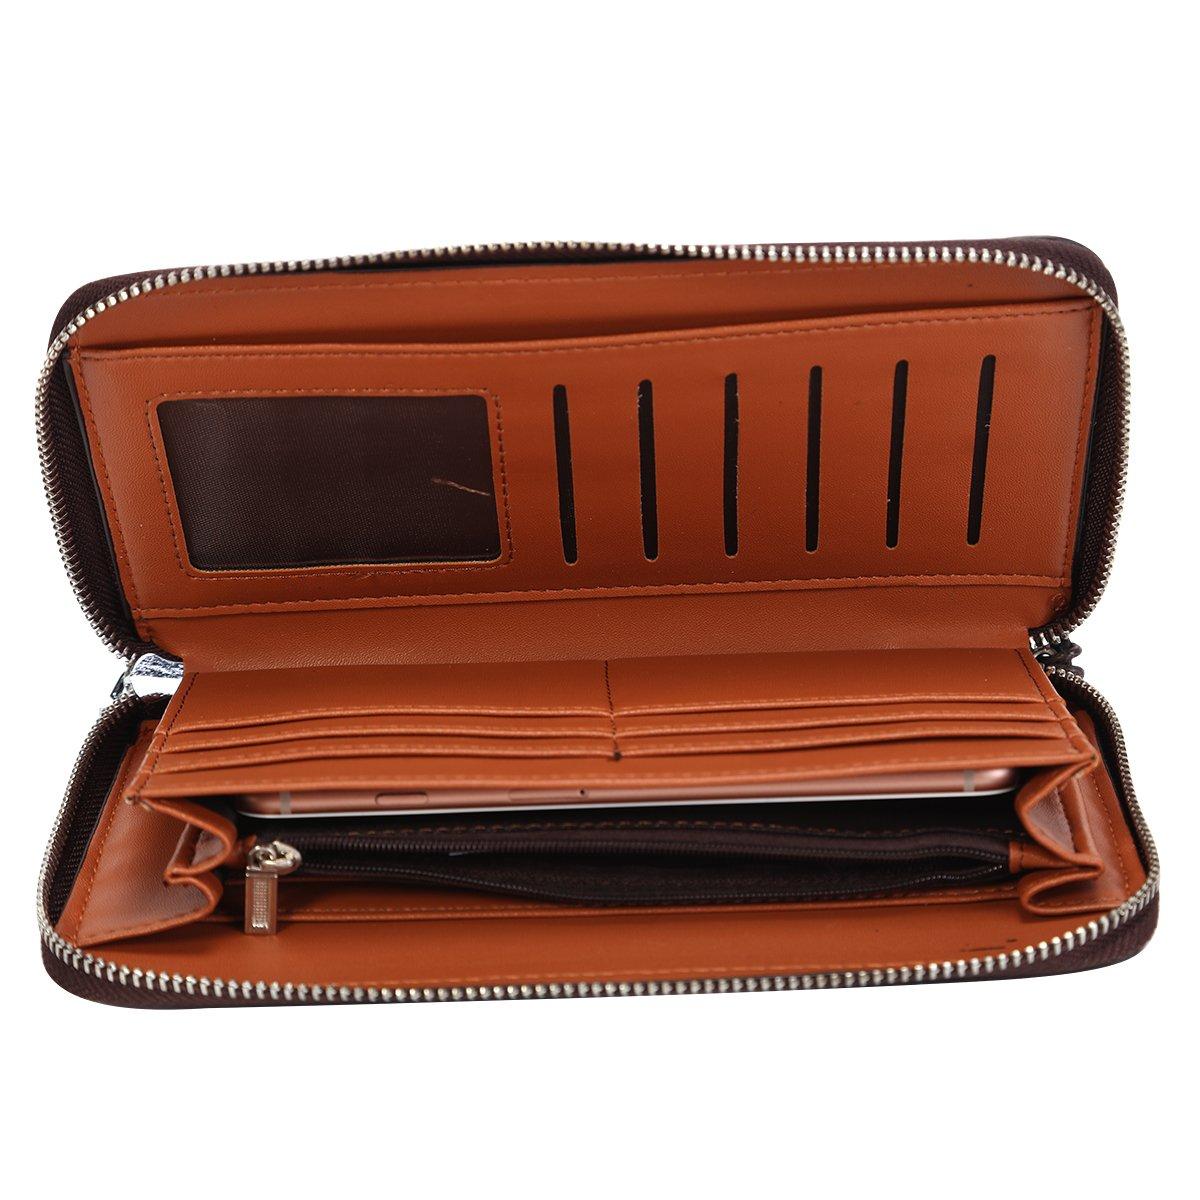 Mens Clutch Genuine Leather Handbag Organizer Checkbook Wallet Card Case by HOLYBIRD (Image #5)